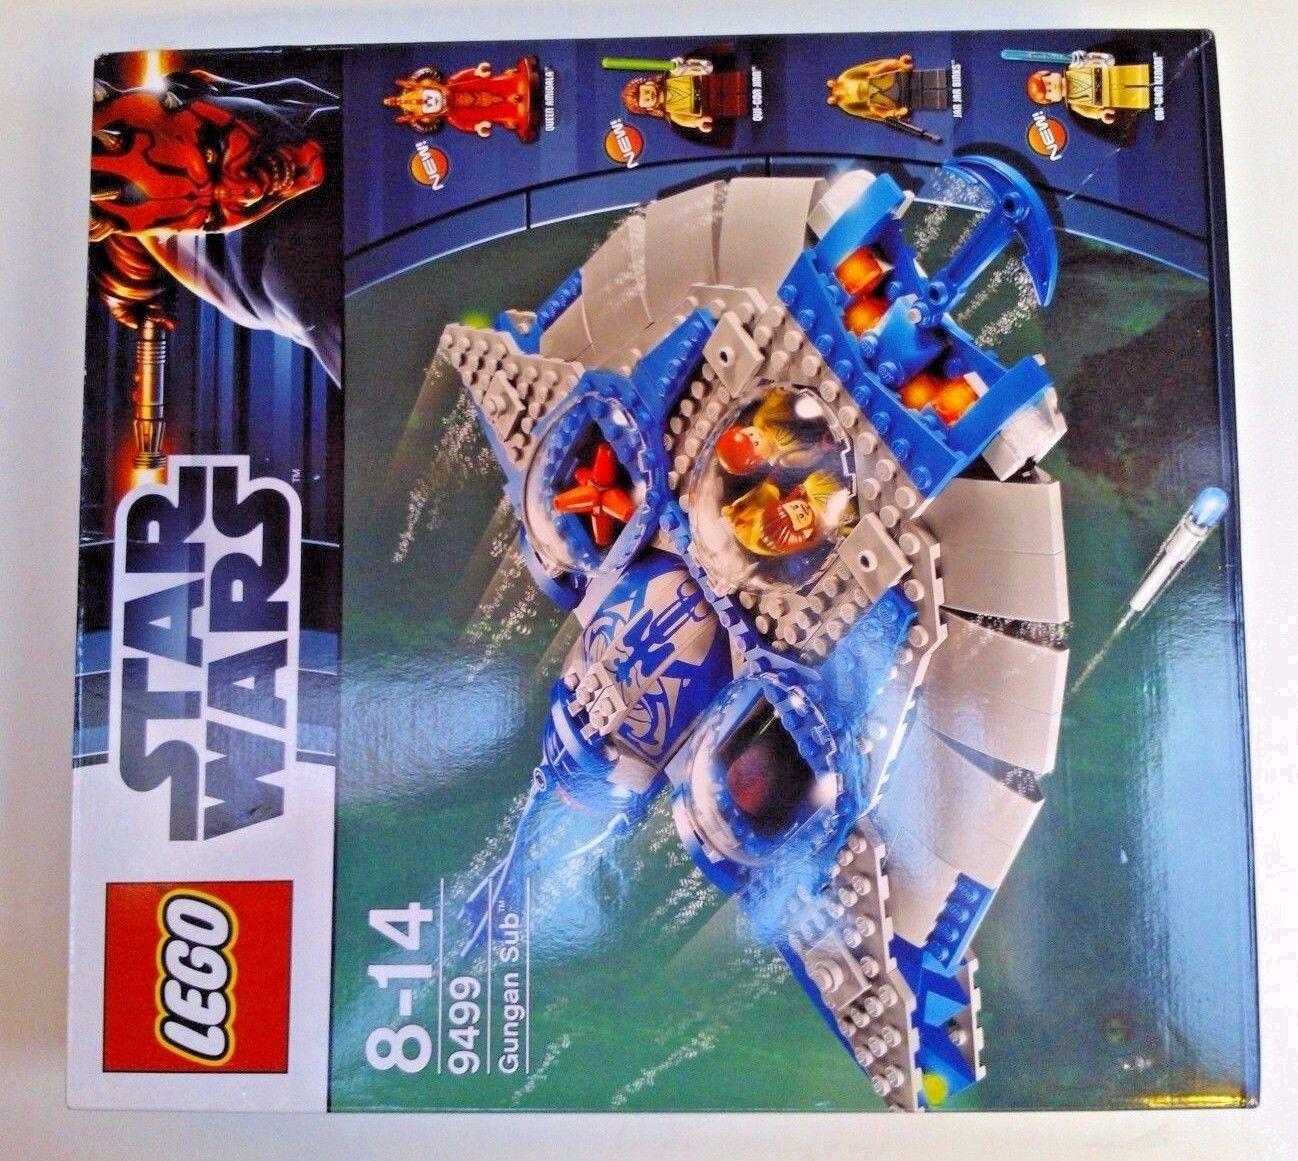 LEGO estrella guerras  9499 Gungan regina Amidala Obi-Wan Kenobi Qui-Gon Jinn lol Jar jar  tutti i beni sono speciali